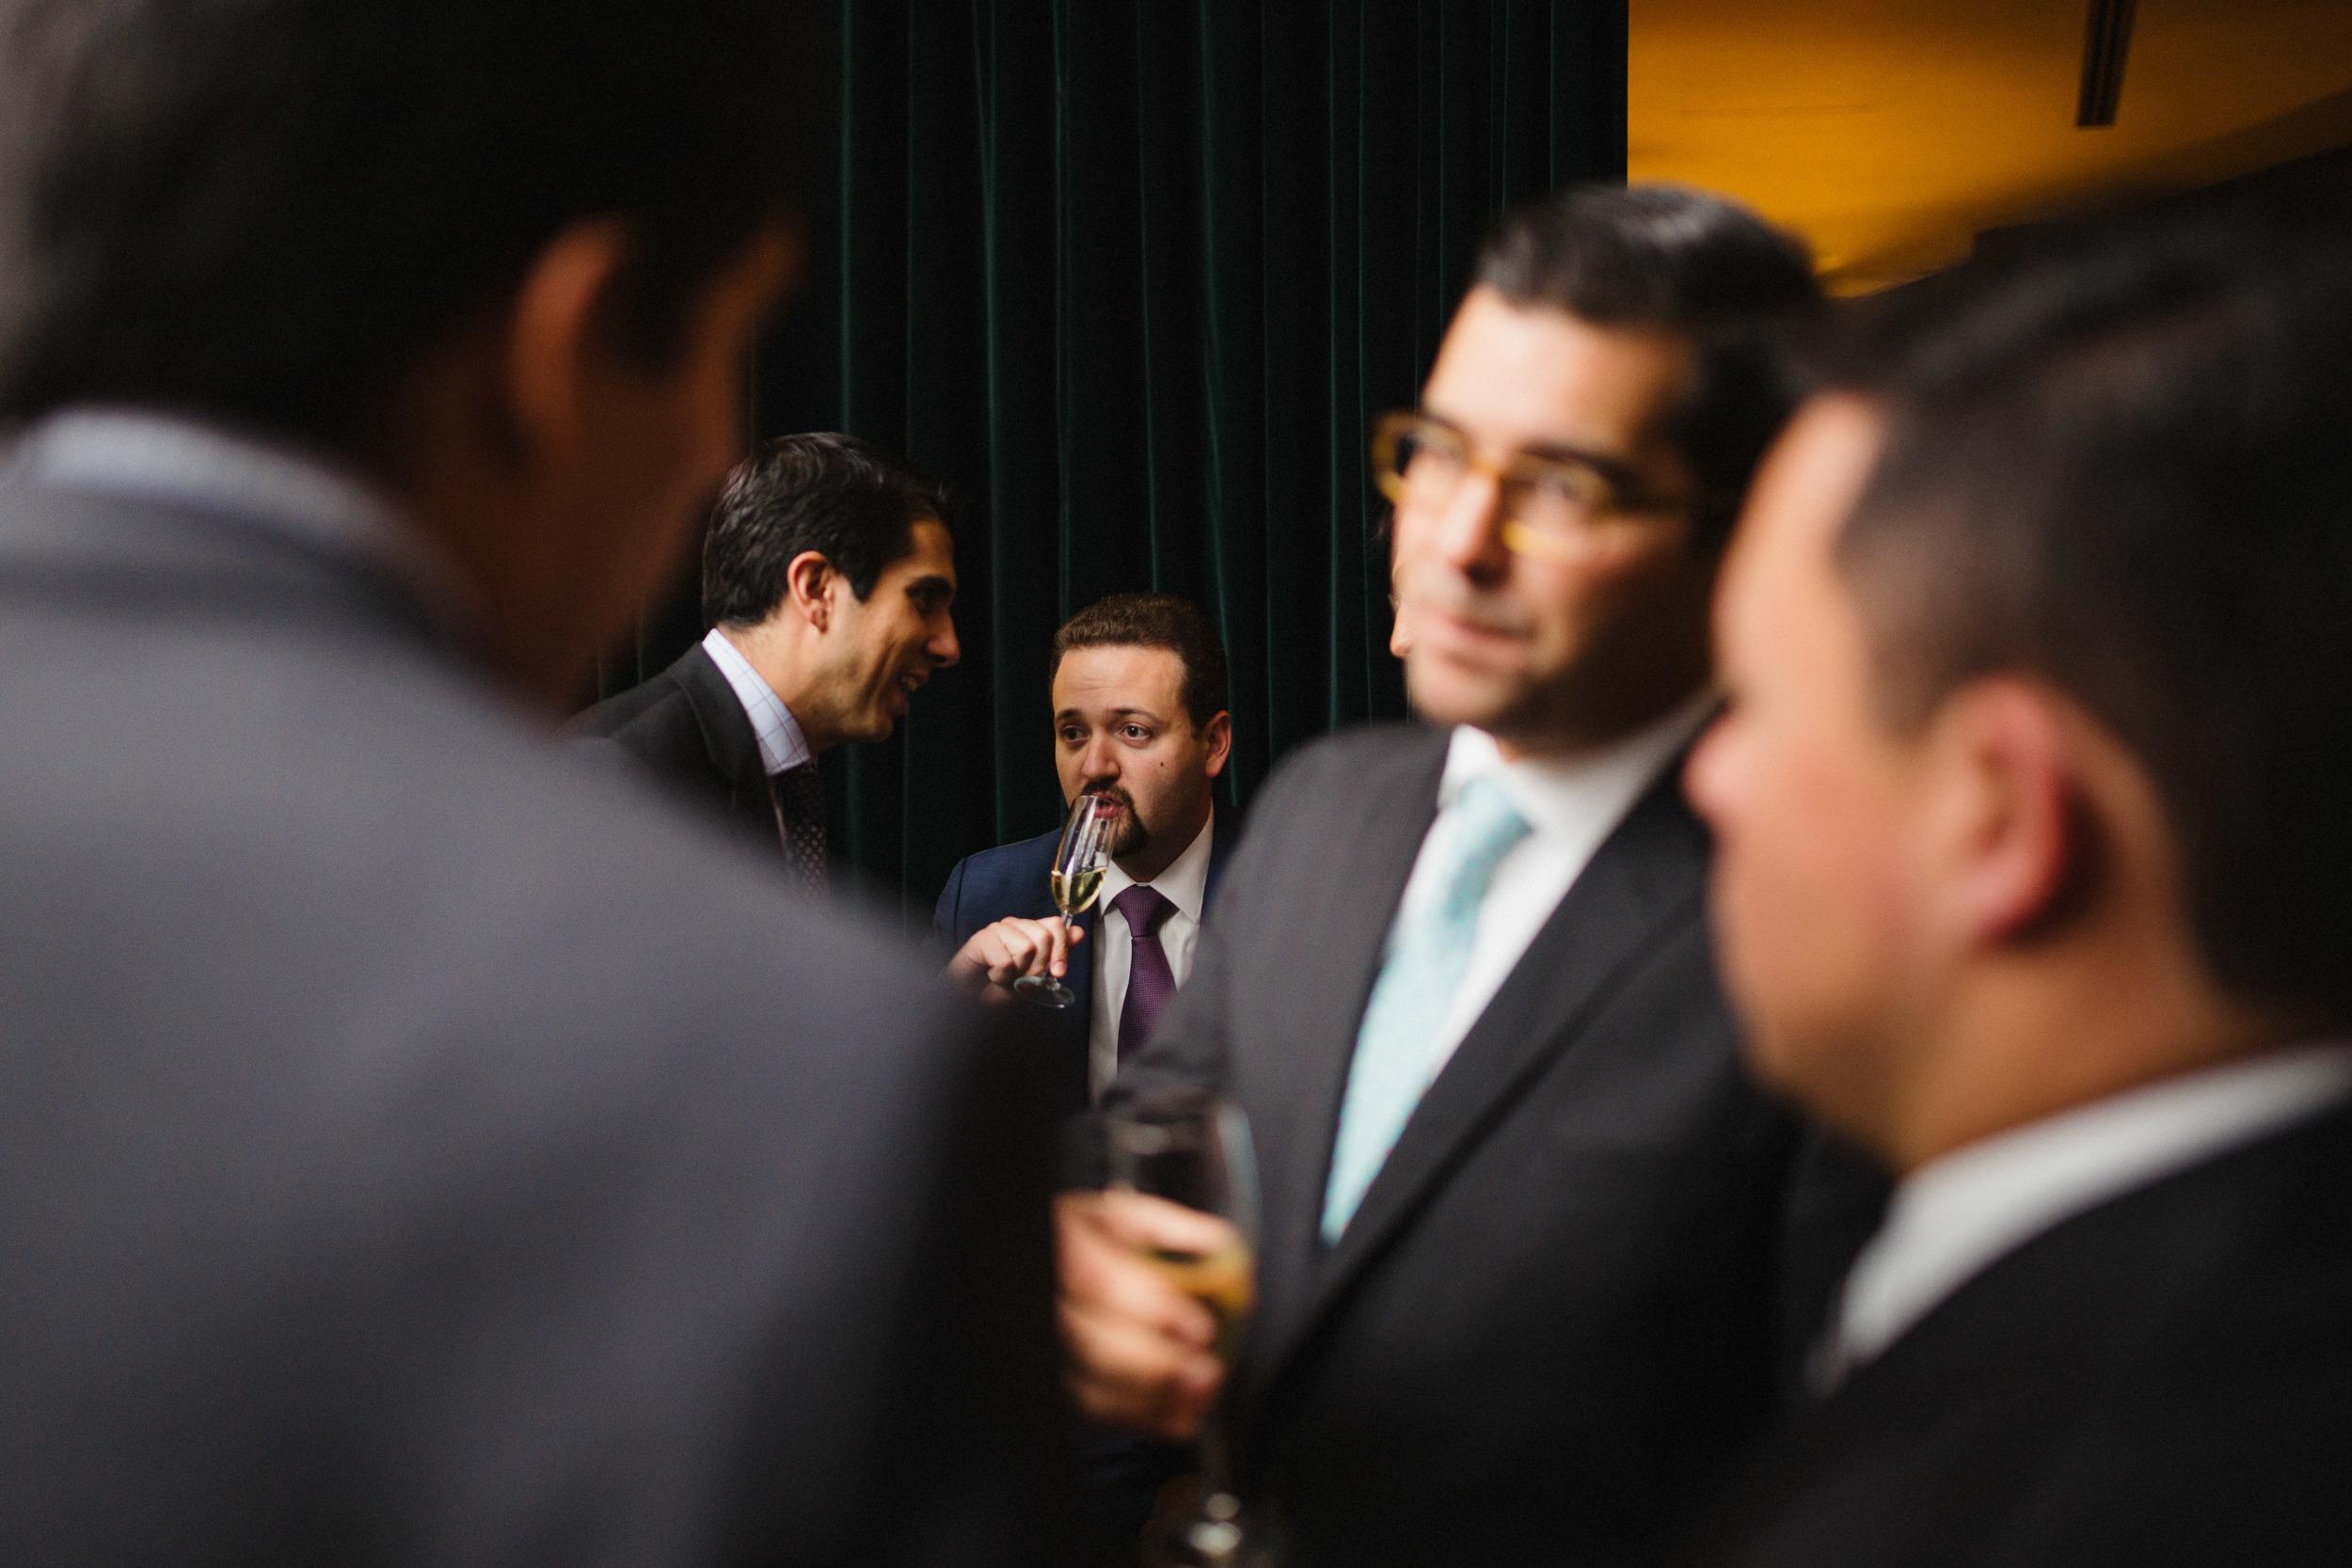 MaurizioSolisBroca.Photography-piso51-mexico-torre mayor-cdmx-20151128DSC04432-Edit.jpg